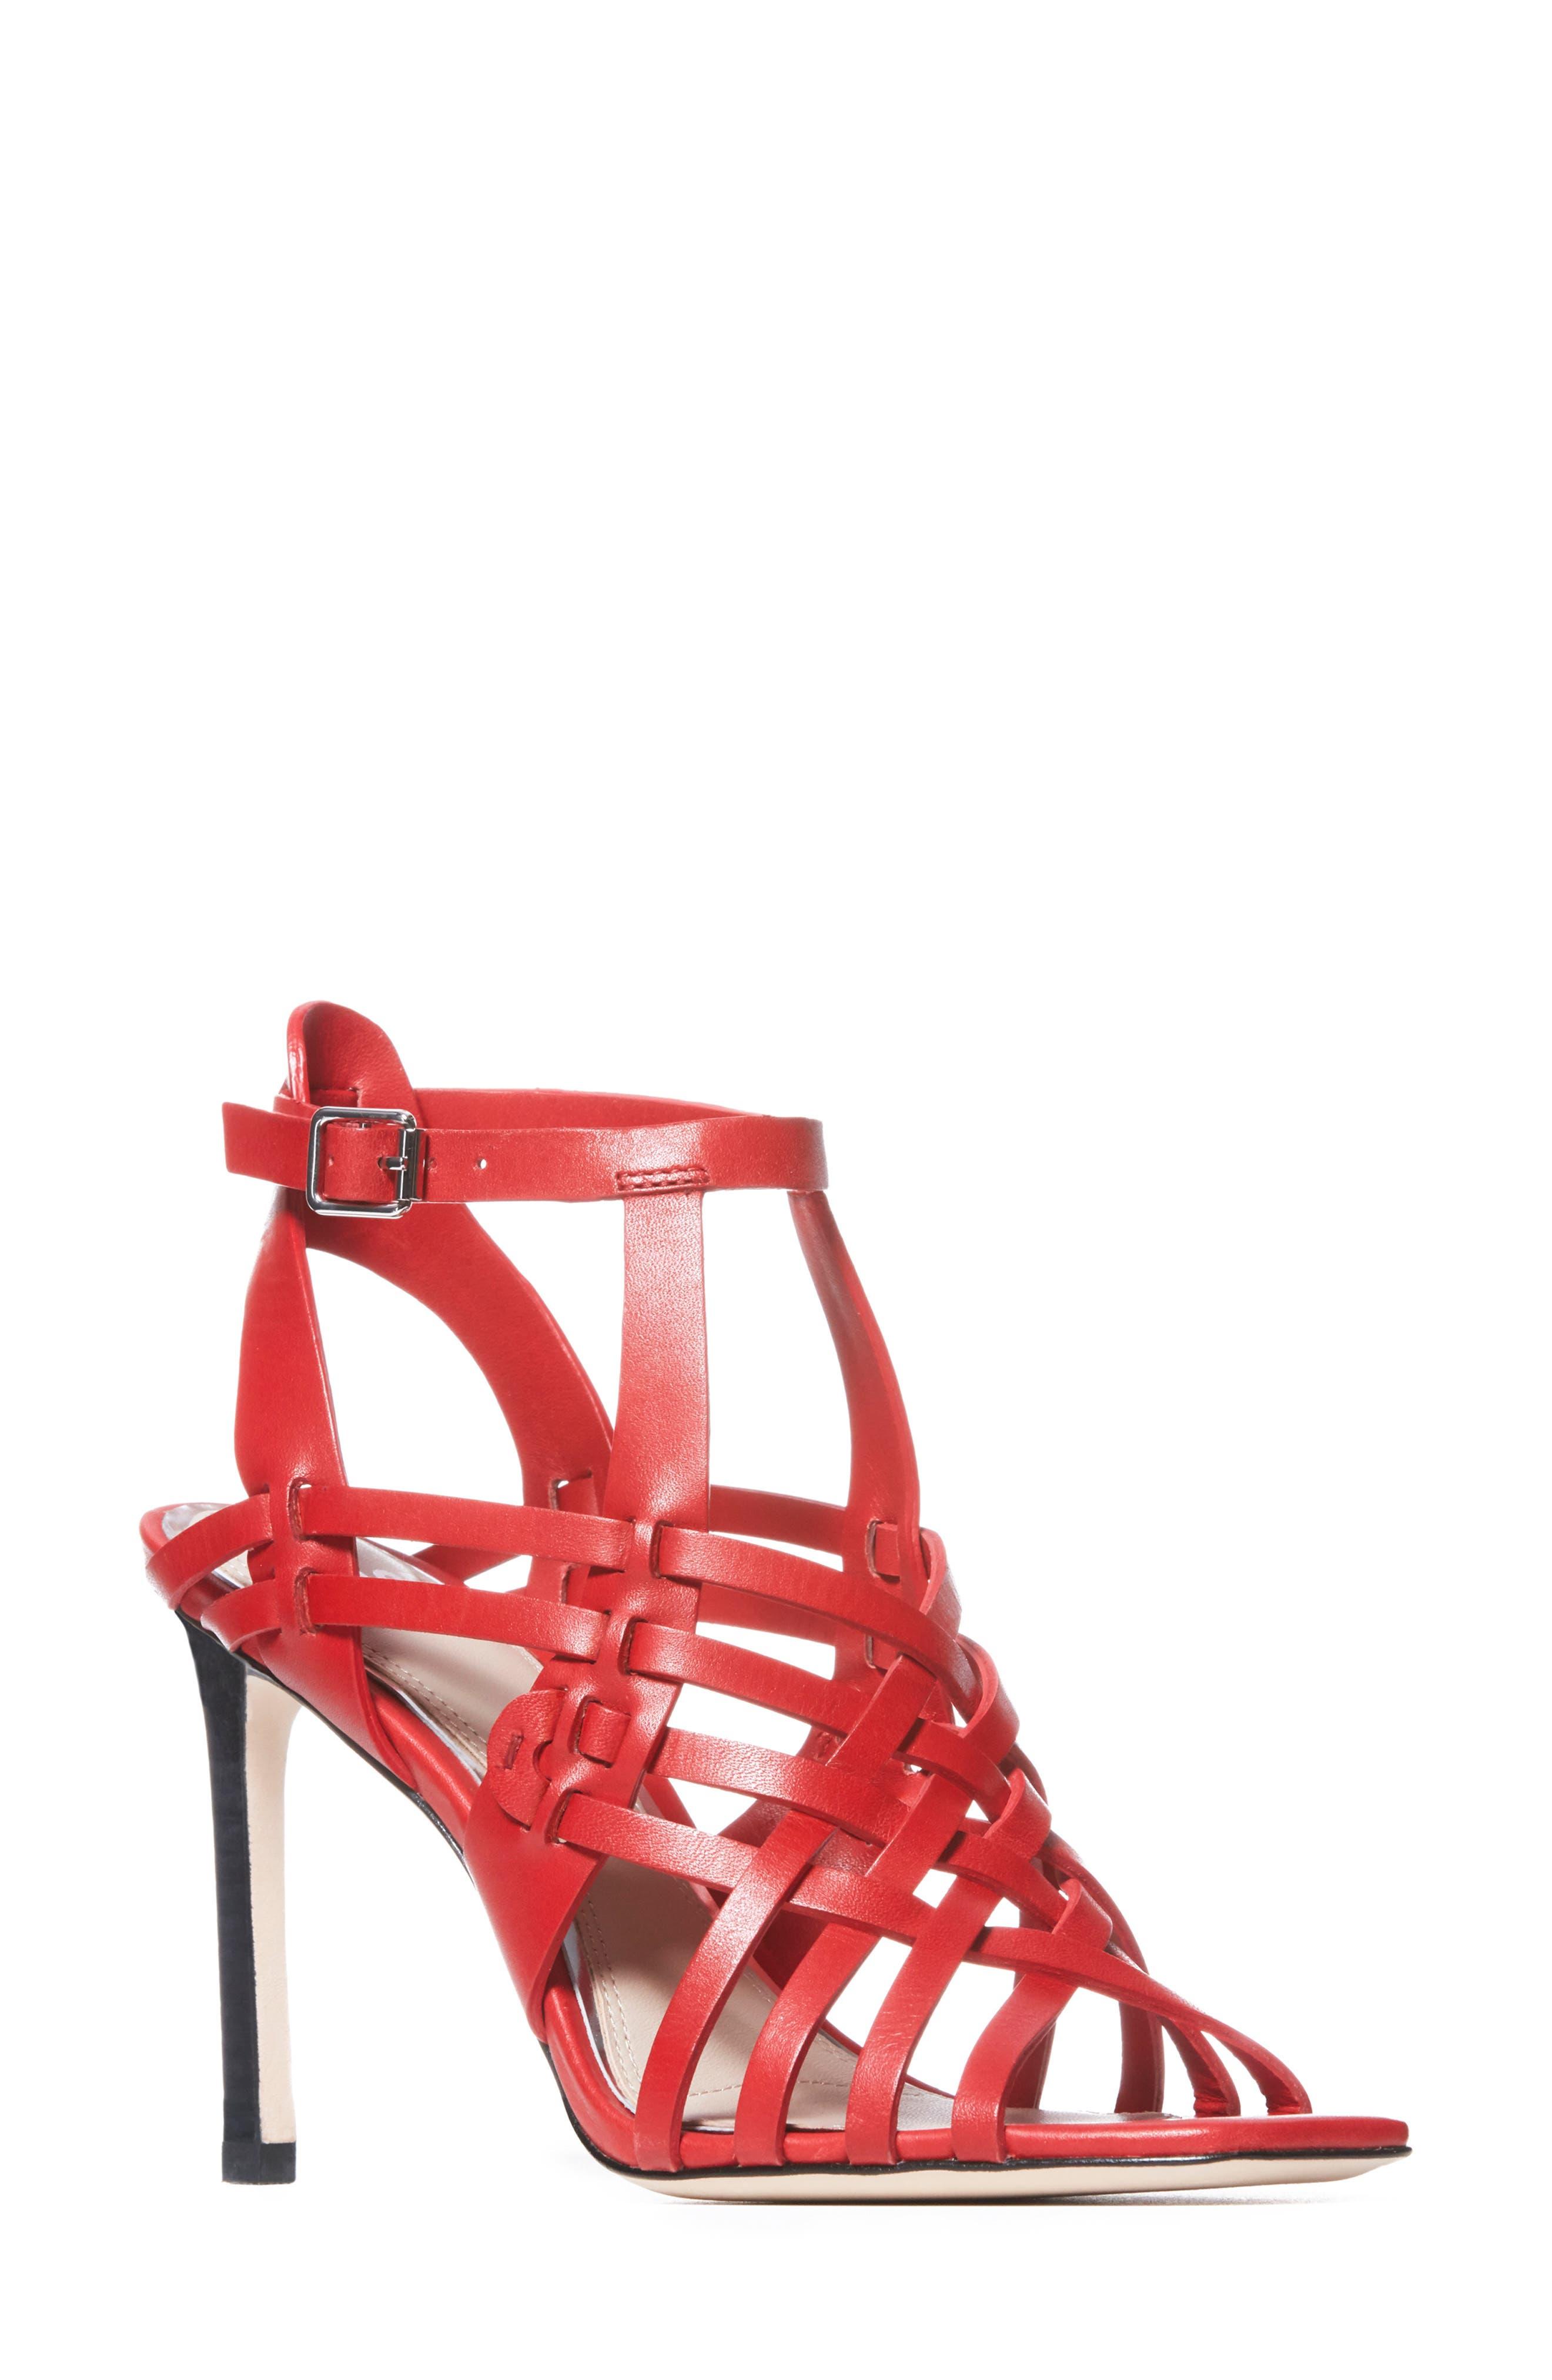 Image of PAIGE Verso Strappy Stiletto Heel Sandal